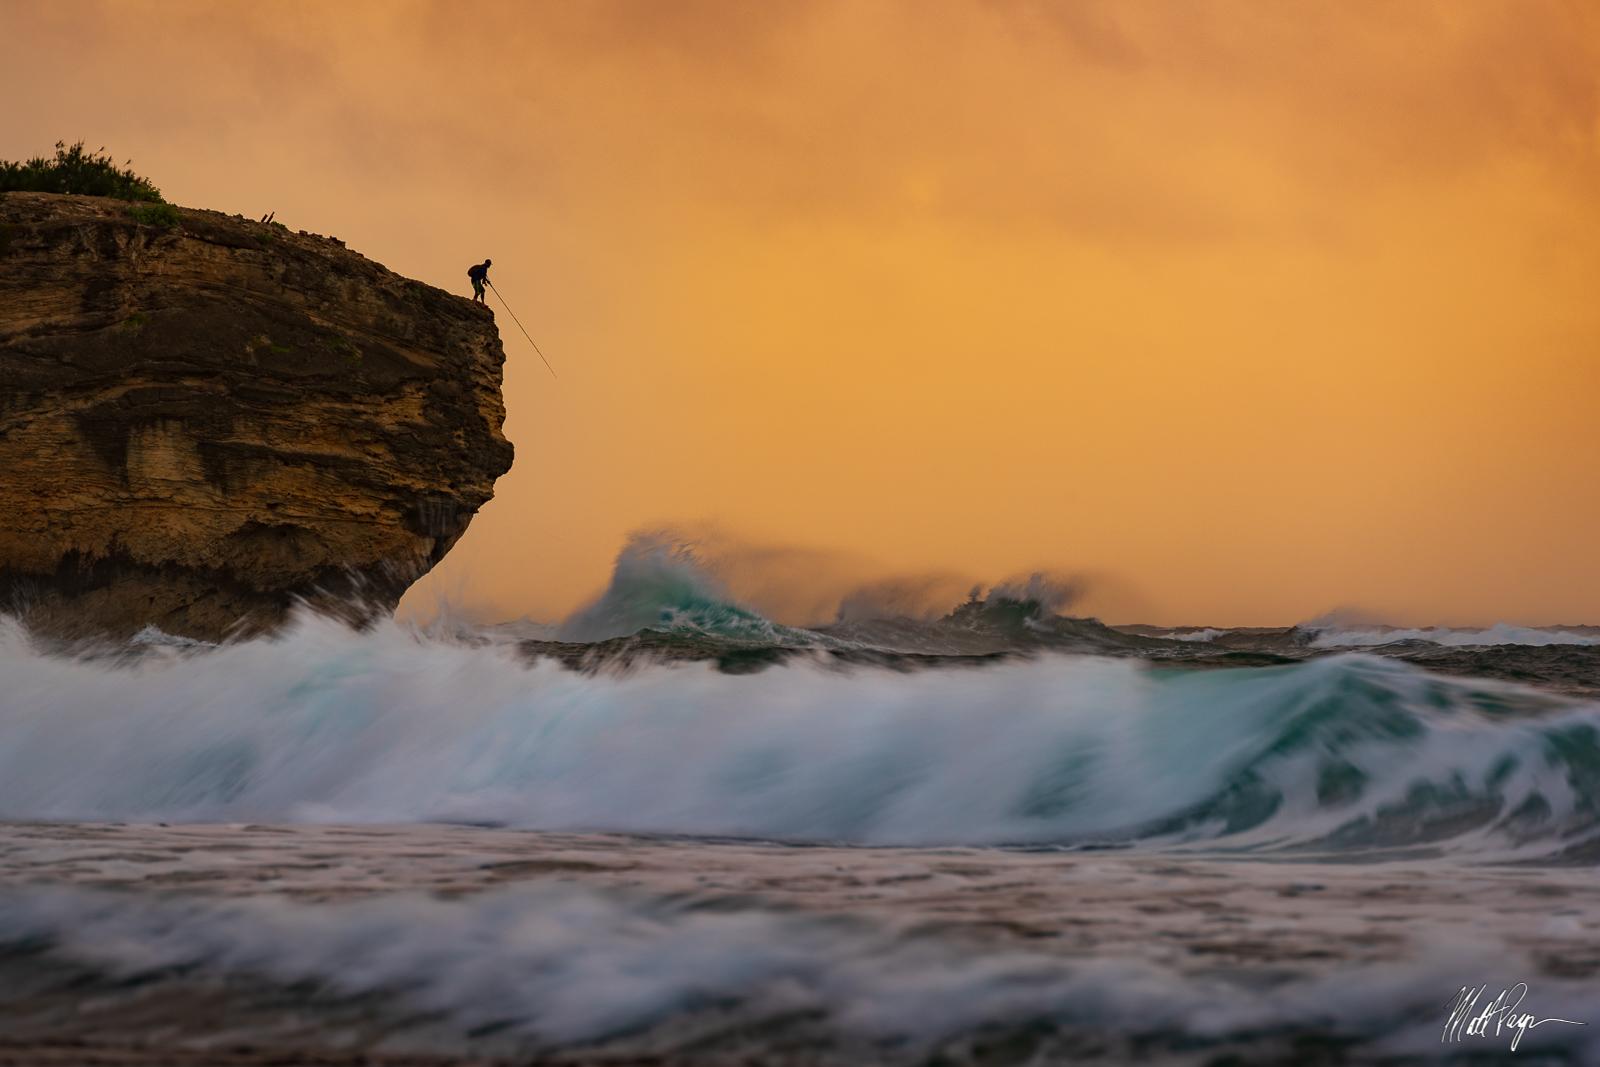 Fisherman, Hawaii, Kauai, Keoniloa Bay, Poipu, Shipwreck Beach, Shore, Waves, fishing, photo